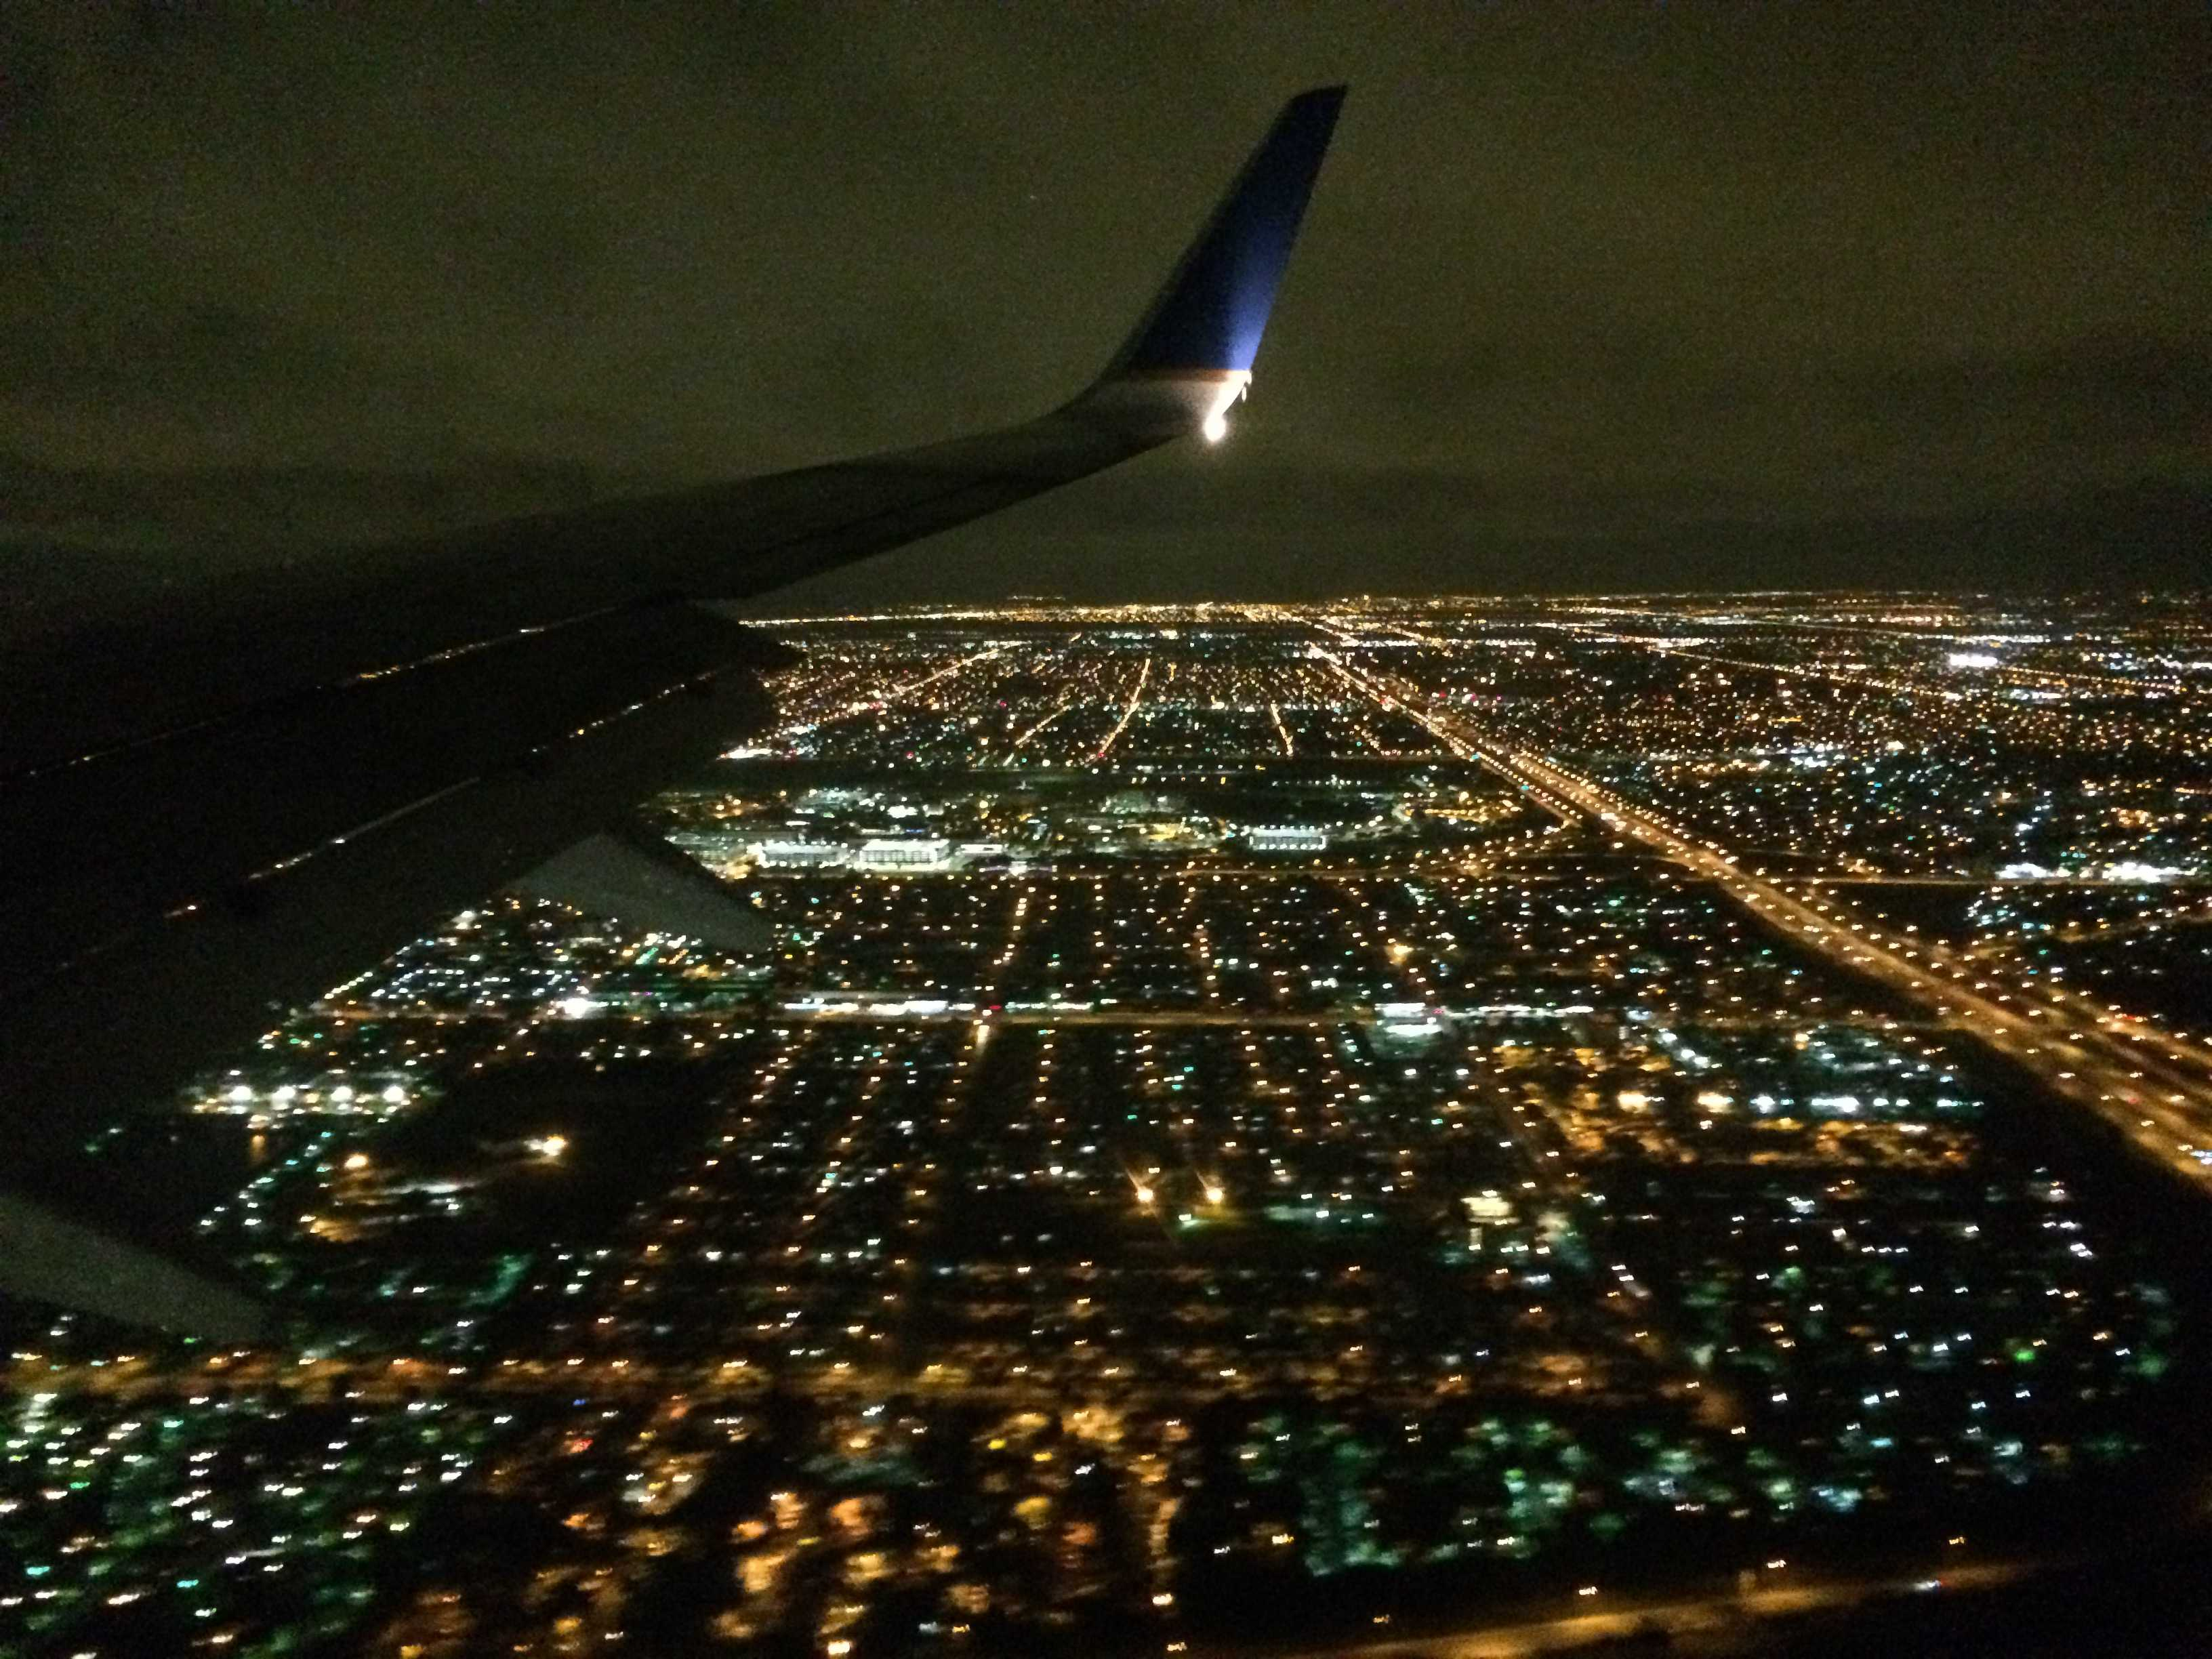 Best Plane Window Seat View Between Newark And Miami